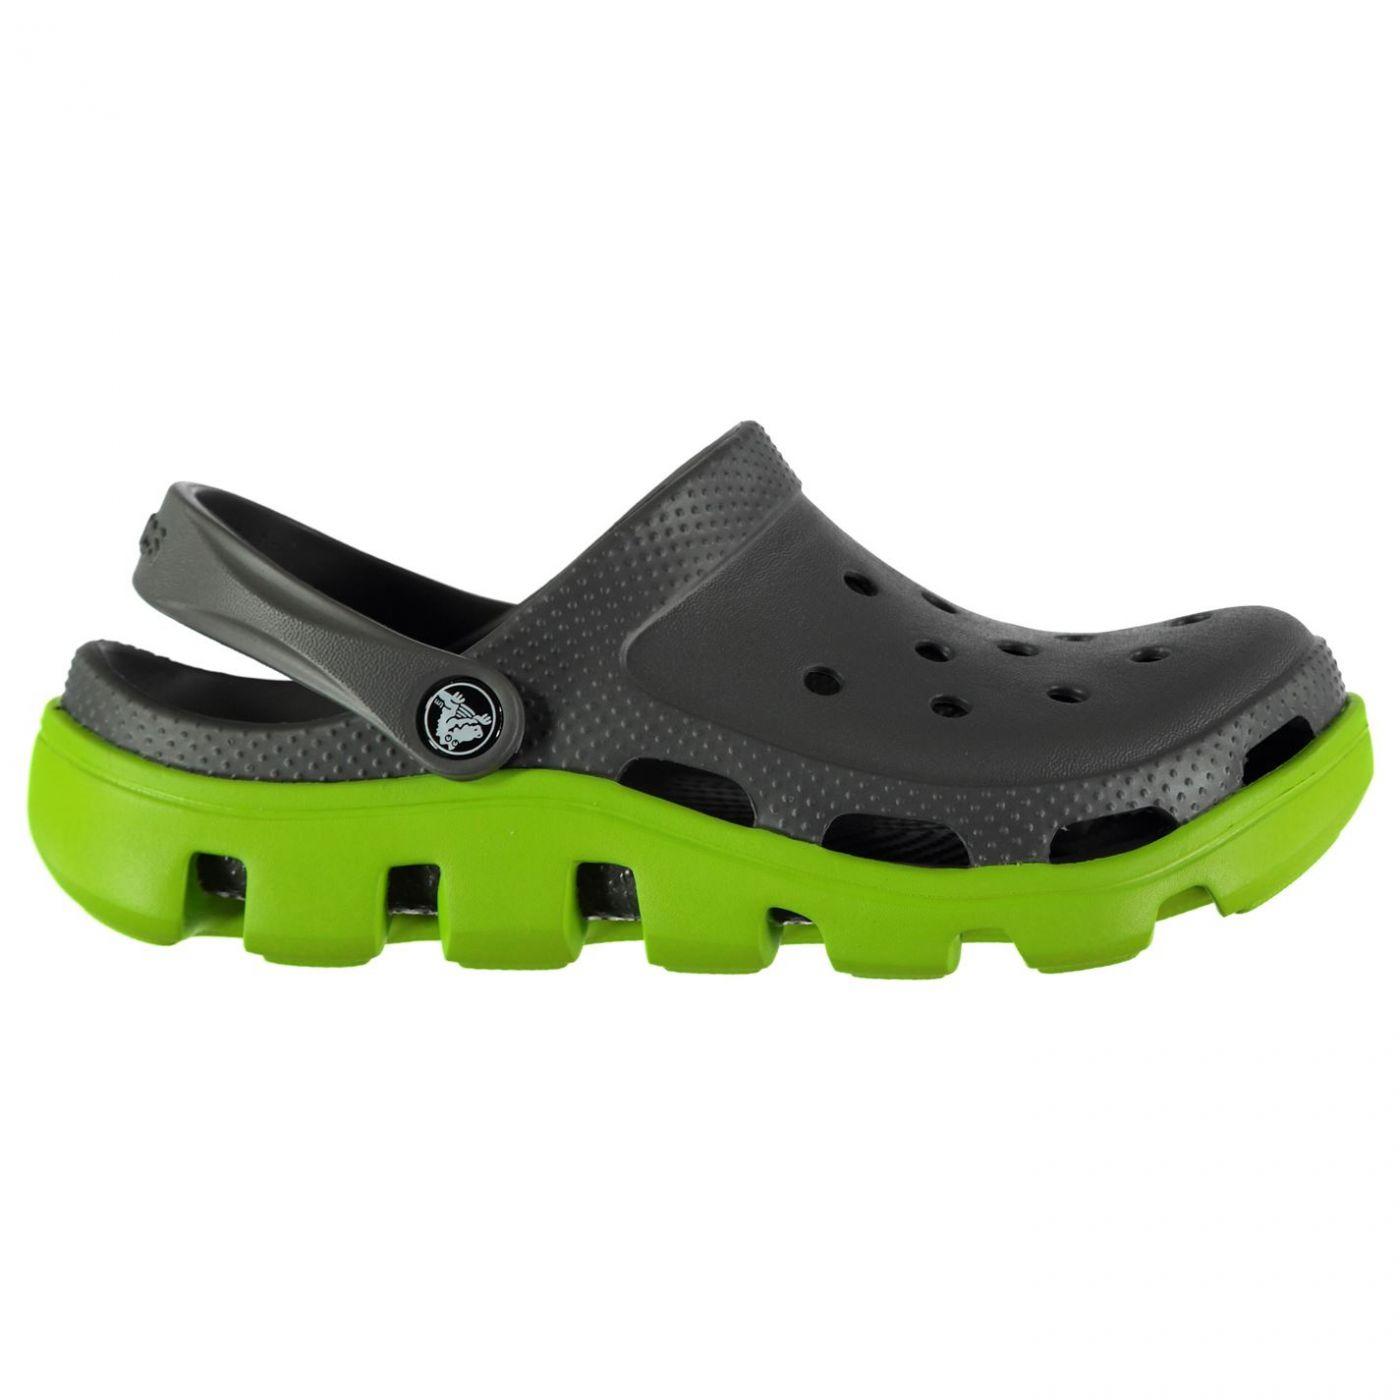 Crocs Duet Clogs Ladies